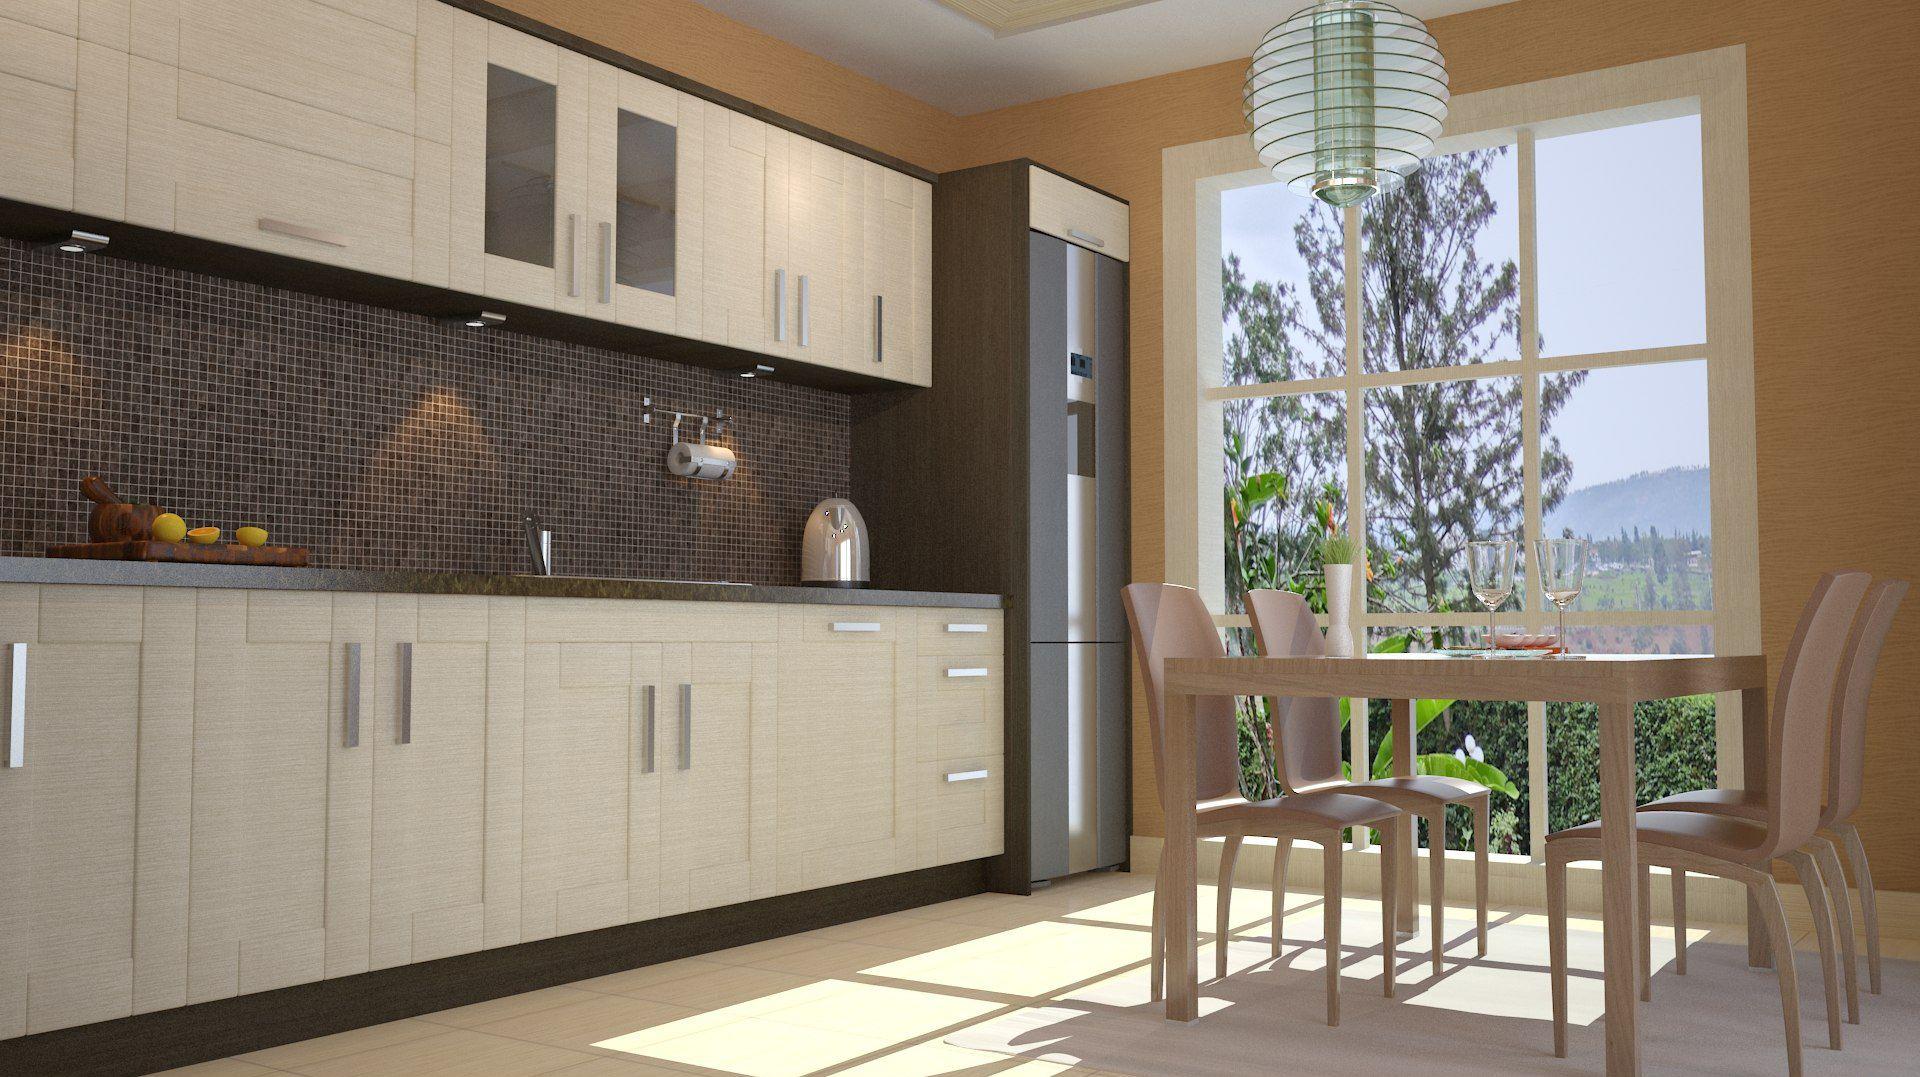 Pavimenti per sweet home d progettare cucina d online gratis